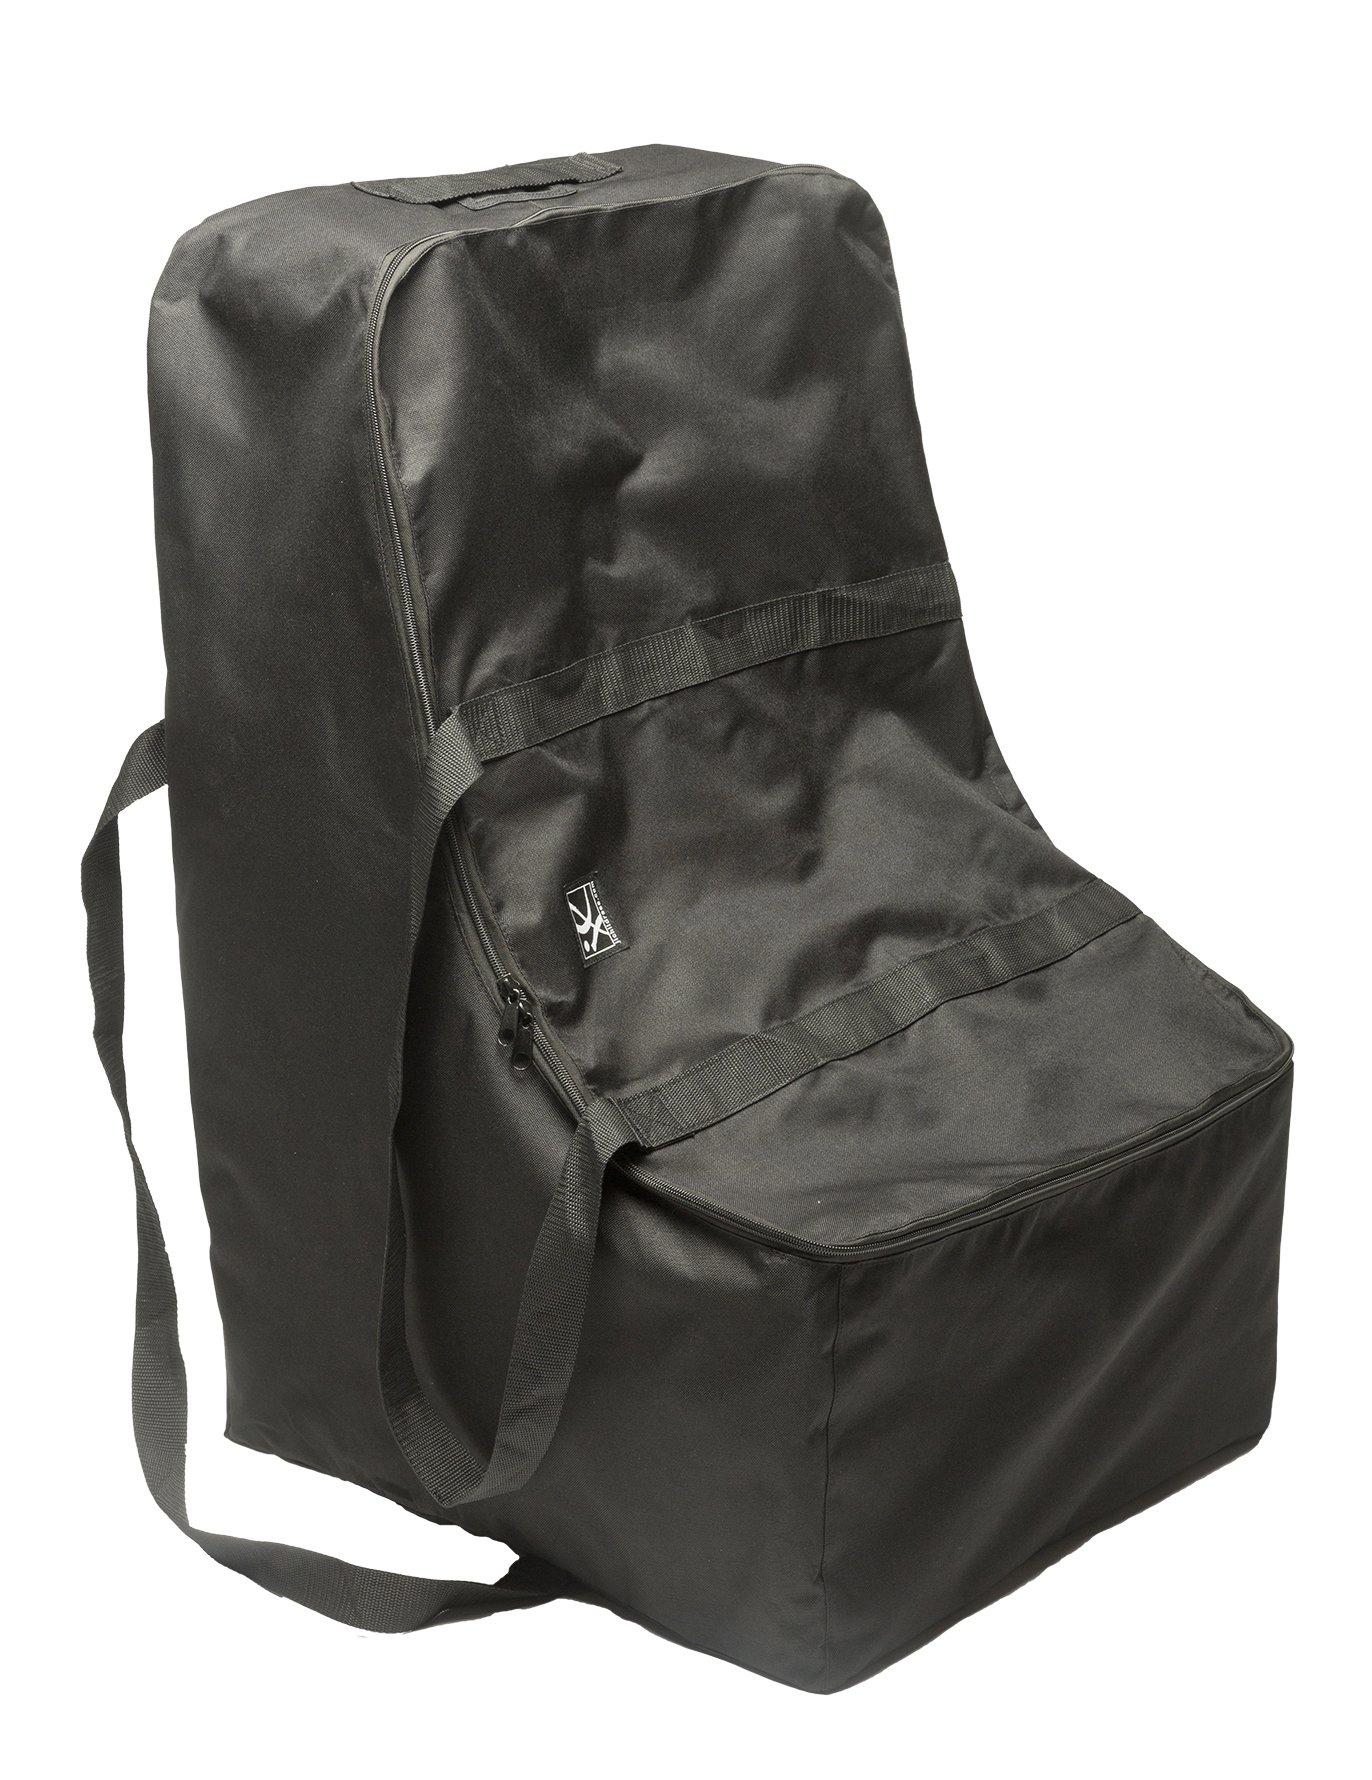 j l childress universal side carry car seat travel bag black amazon. Black Bedroom Furniture Sets. Home Design Ideas